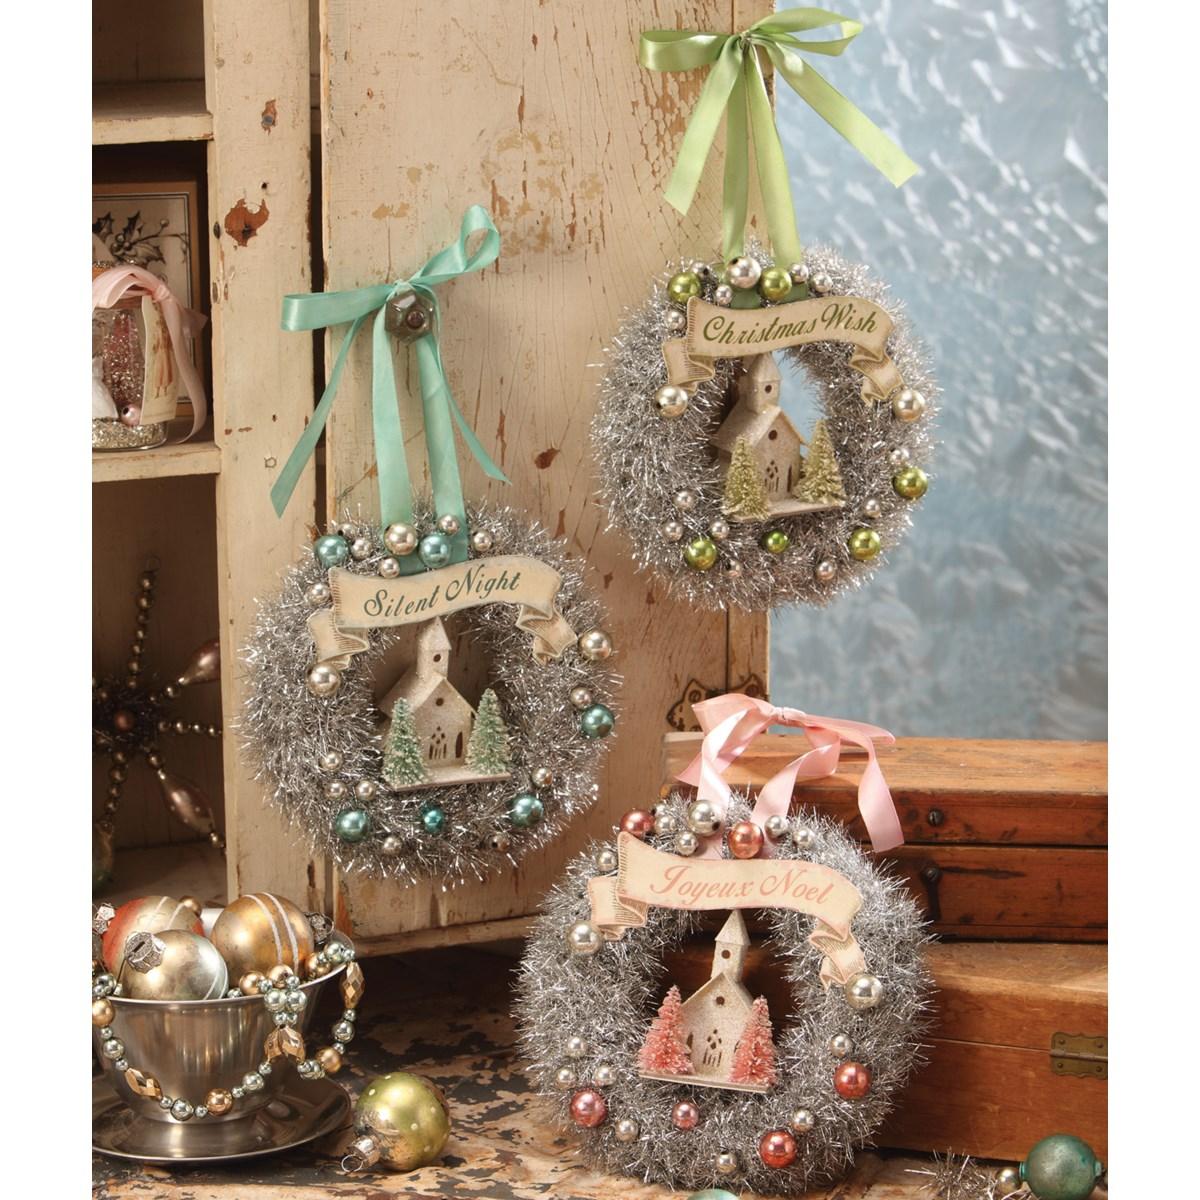 Pastel Wreath 3A